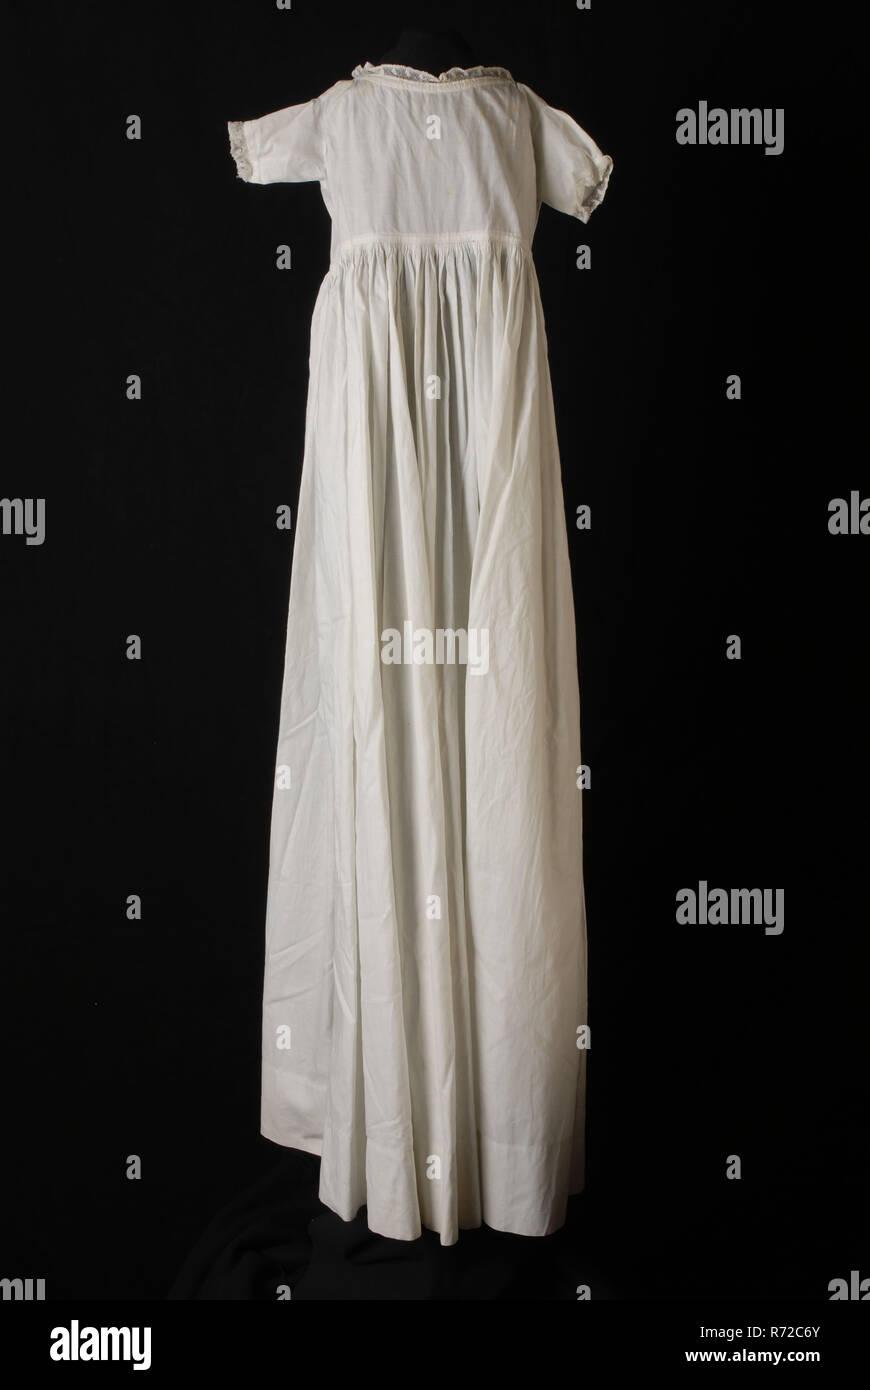 d928b40da27 Long wide-sloping baby slip dress in white cotton